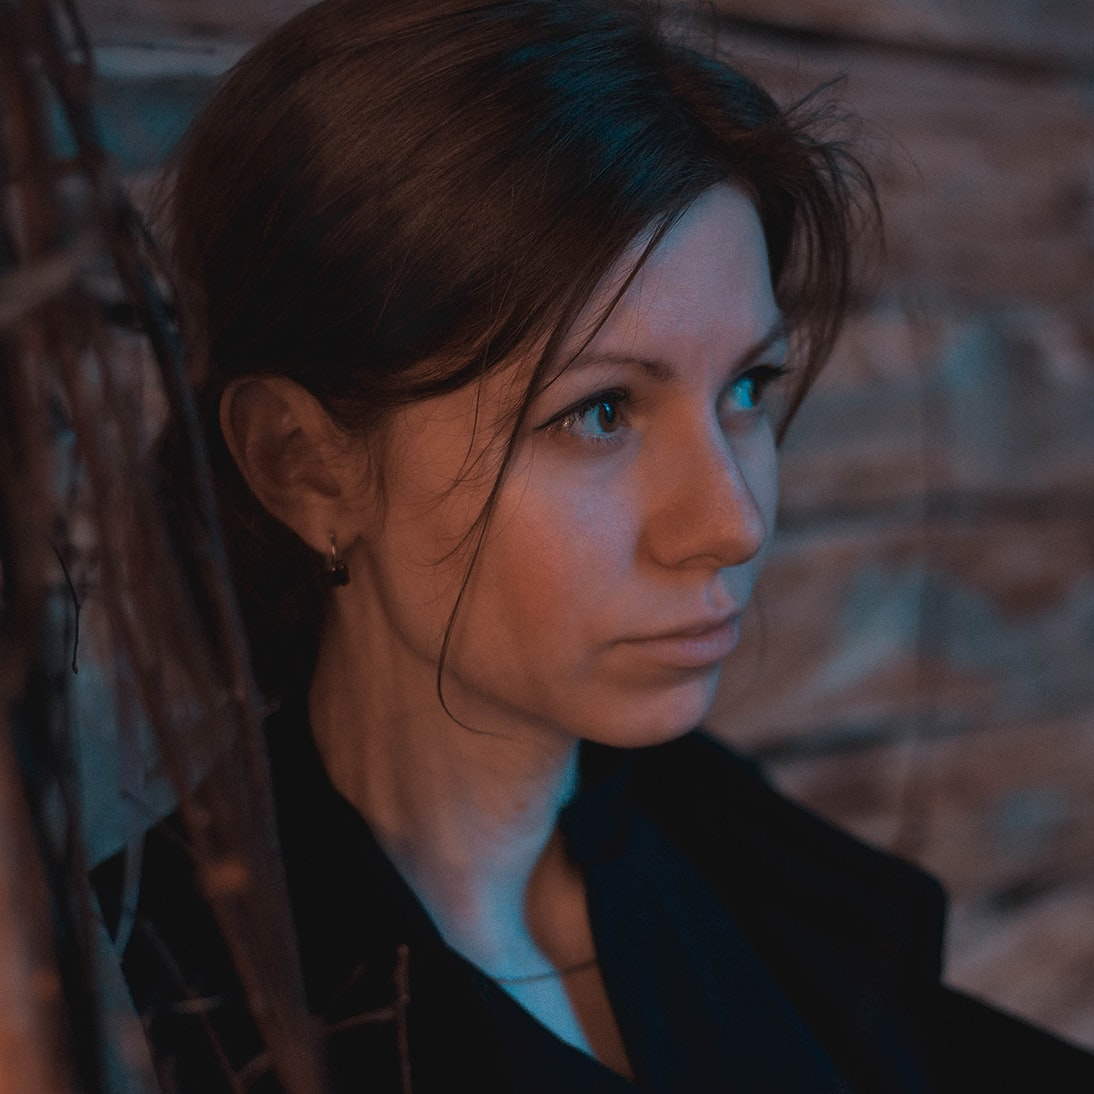 Go to Alina Miroshnichenko's profile